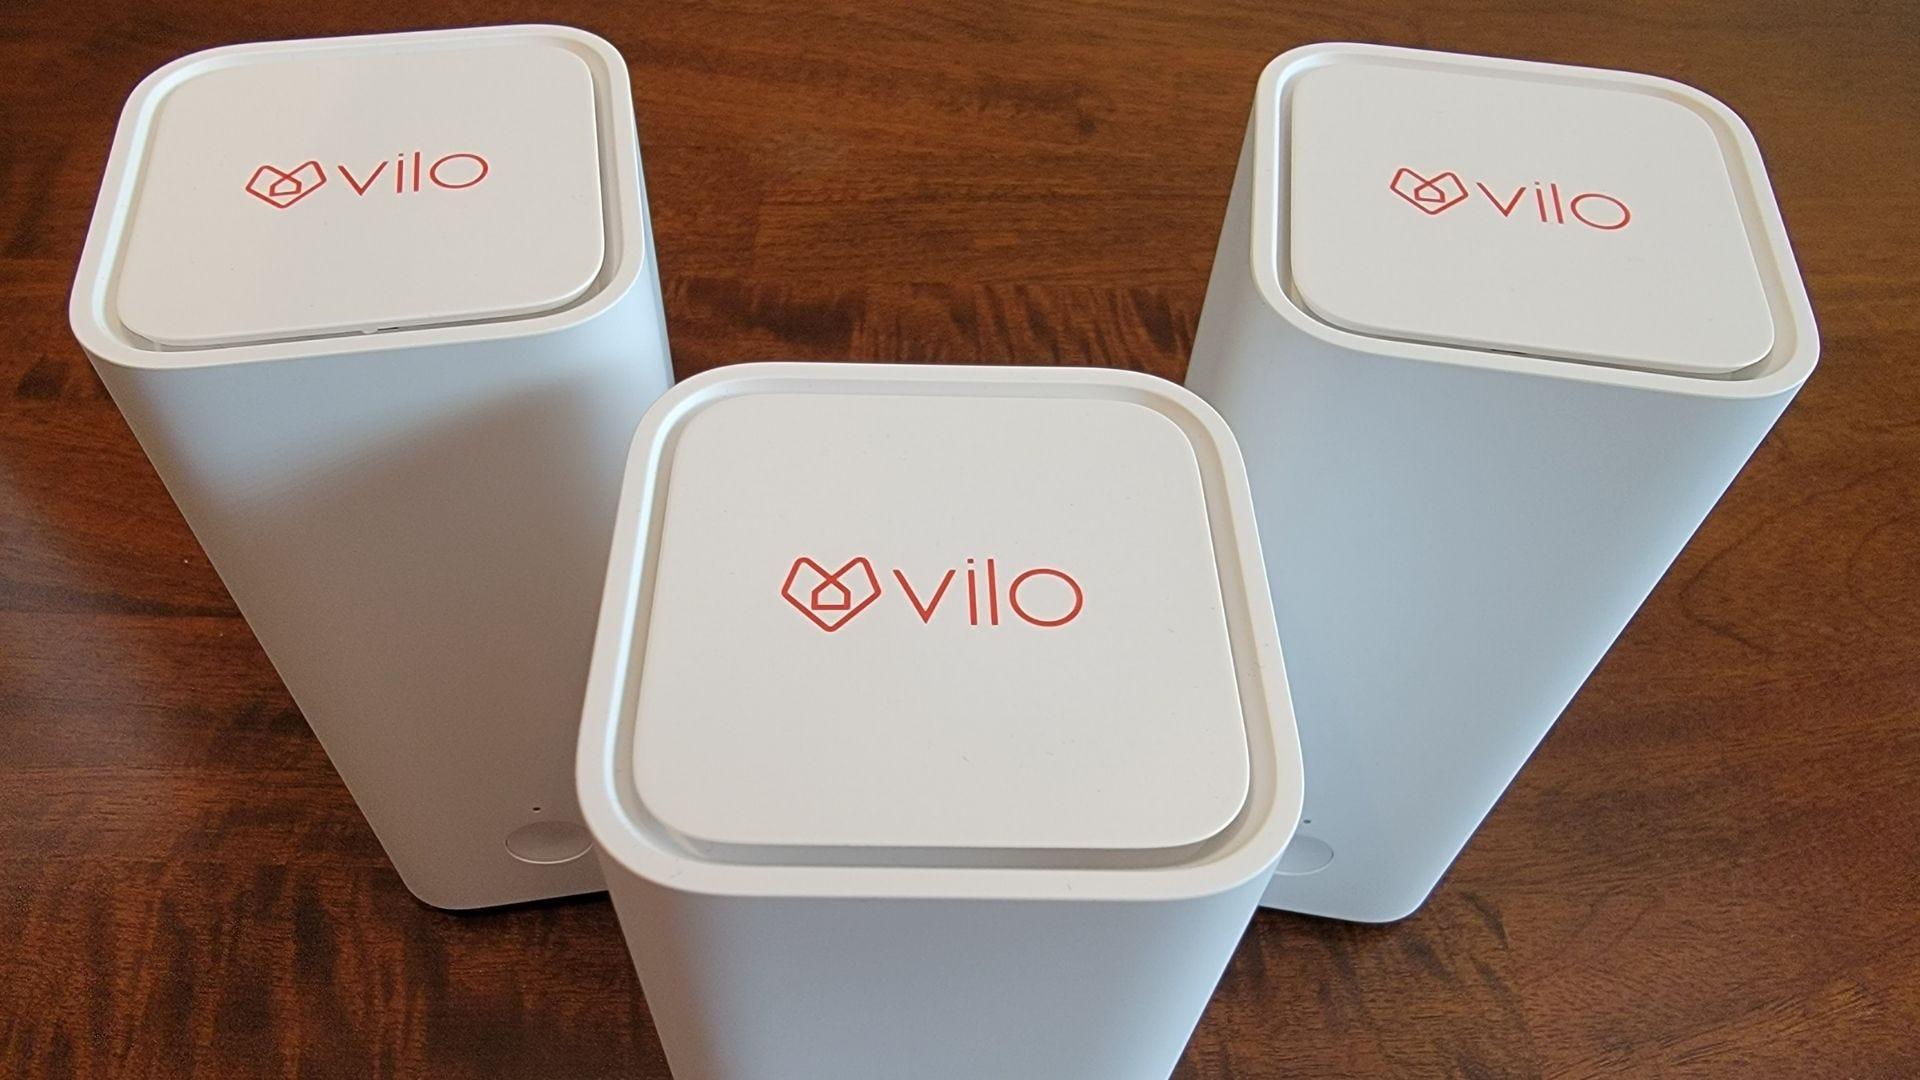 three mesh wifi vilo units showing the logo on top